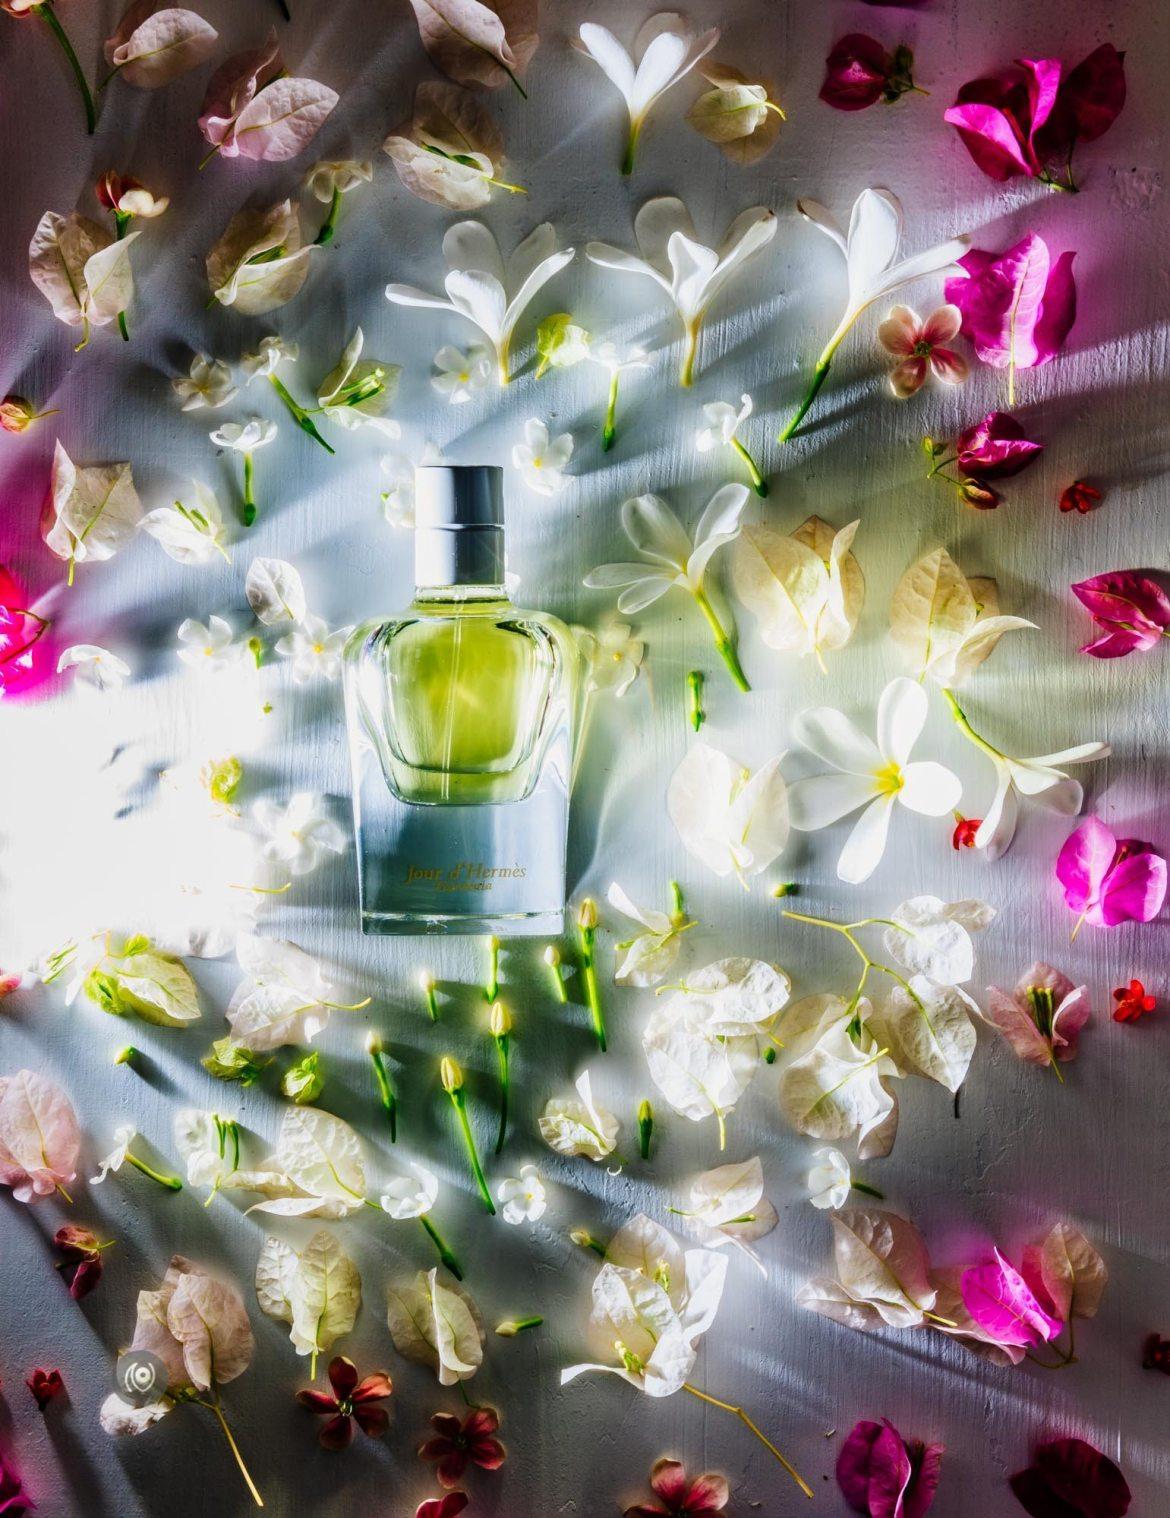 FragranceOfTheMonth-Naina.co-Jour-Hermes-Gardenia-EyesForLuxury-13